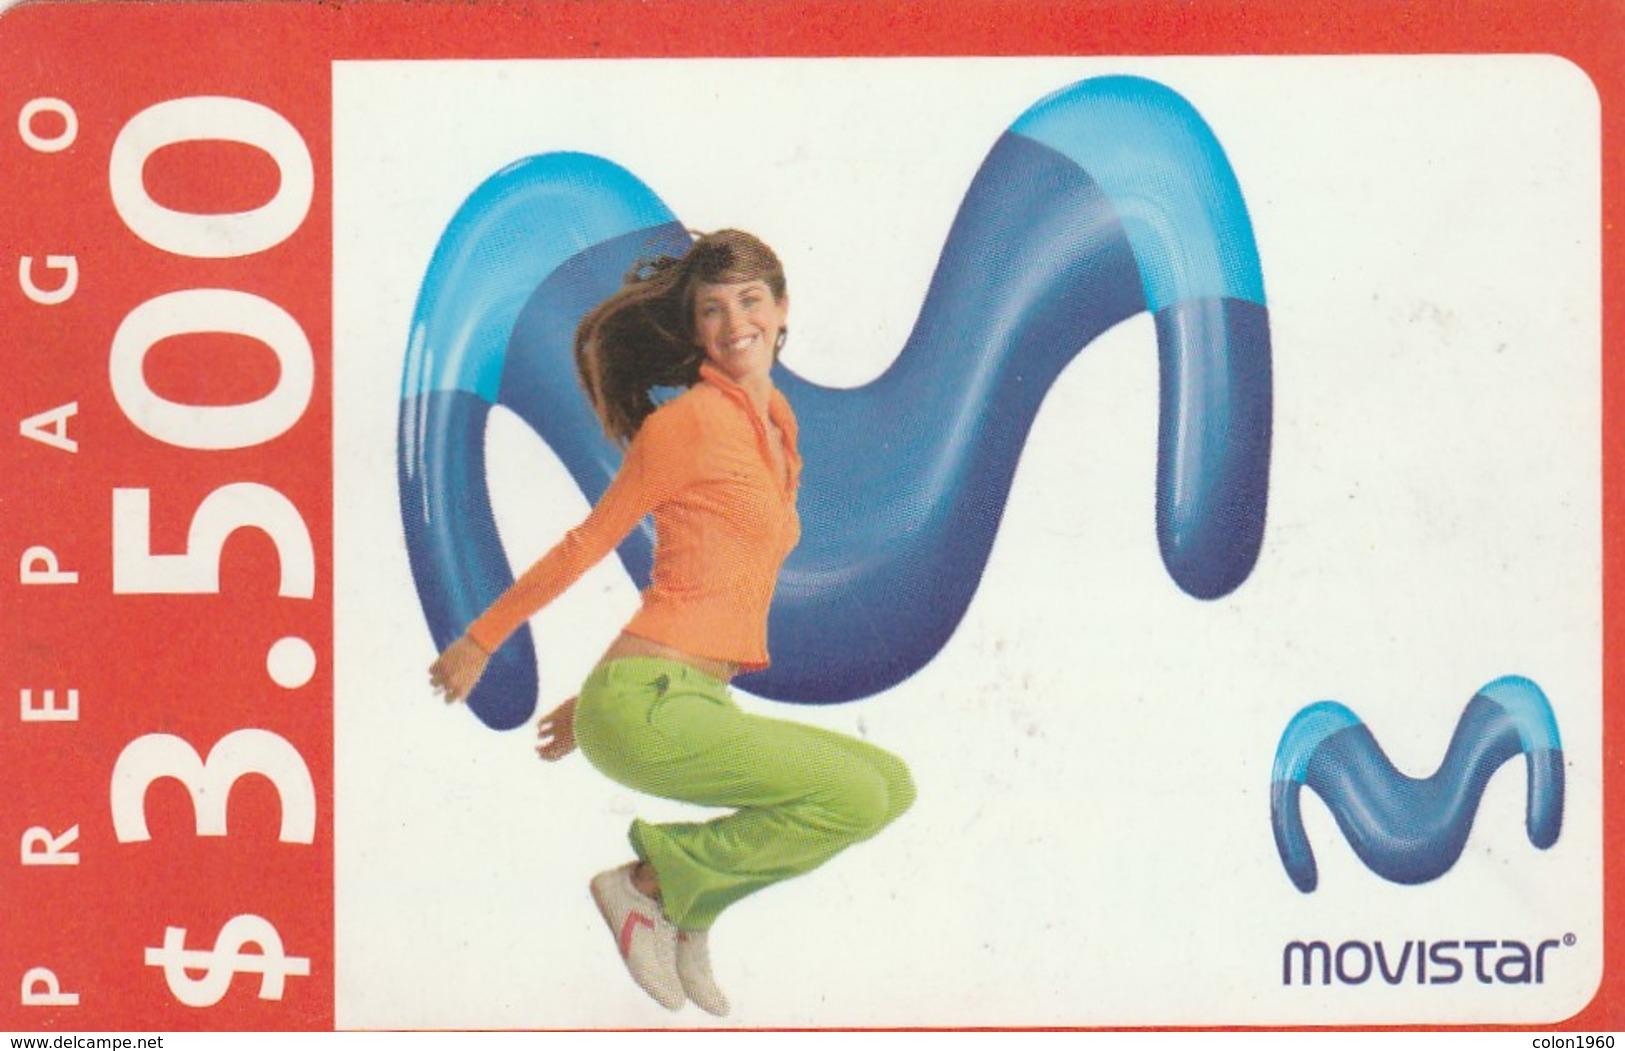 TARJETA TELEFONICA DE CHILE (PREPAGO) Recarga Movistar - Girl. 07-10-08. CL-MOV-REF-0001-09D. (303) - Chile